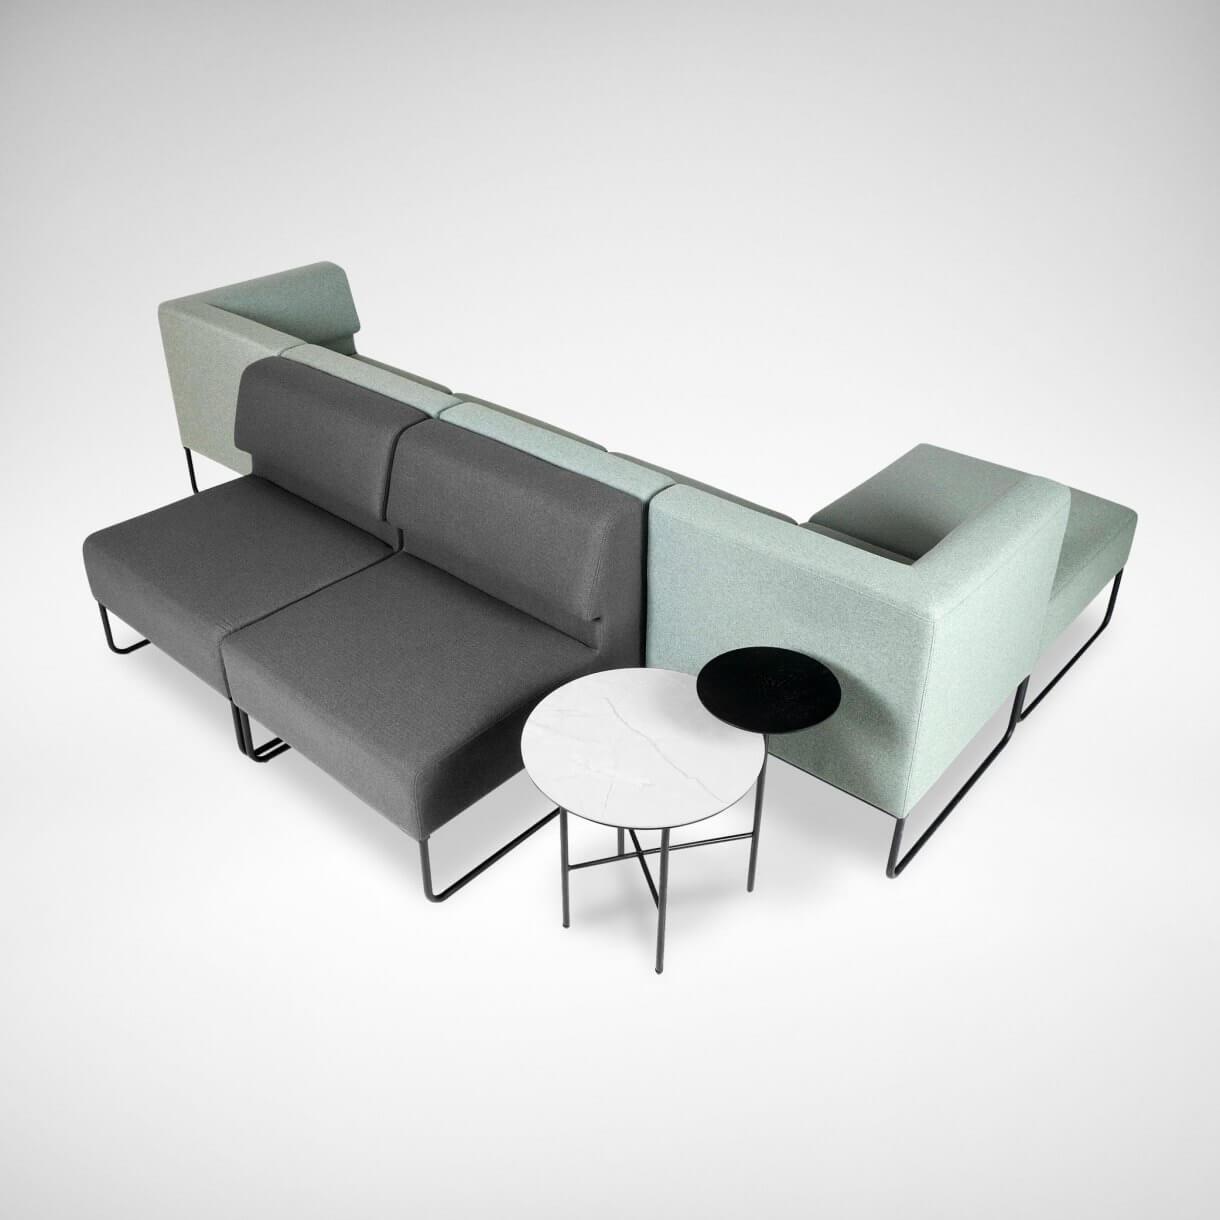 Sofa Arrangement Ideas for the Office Recreation Area - Comfort Furniture